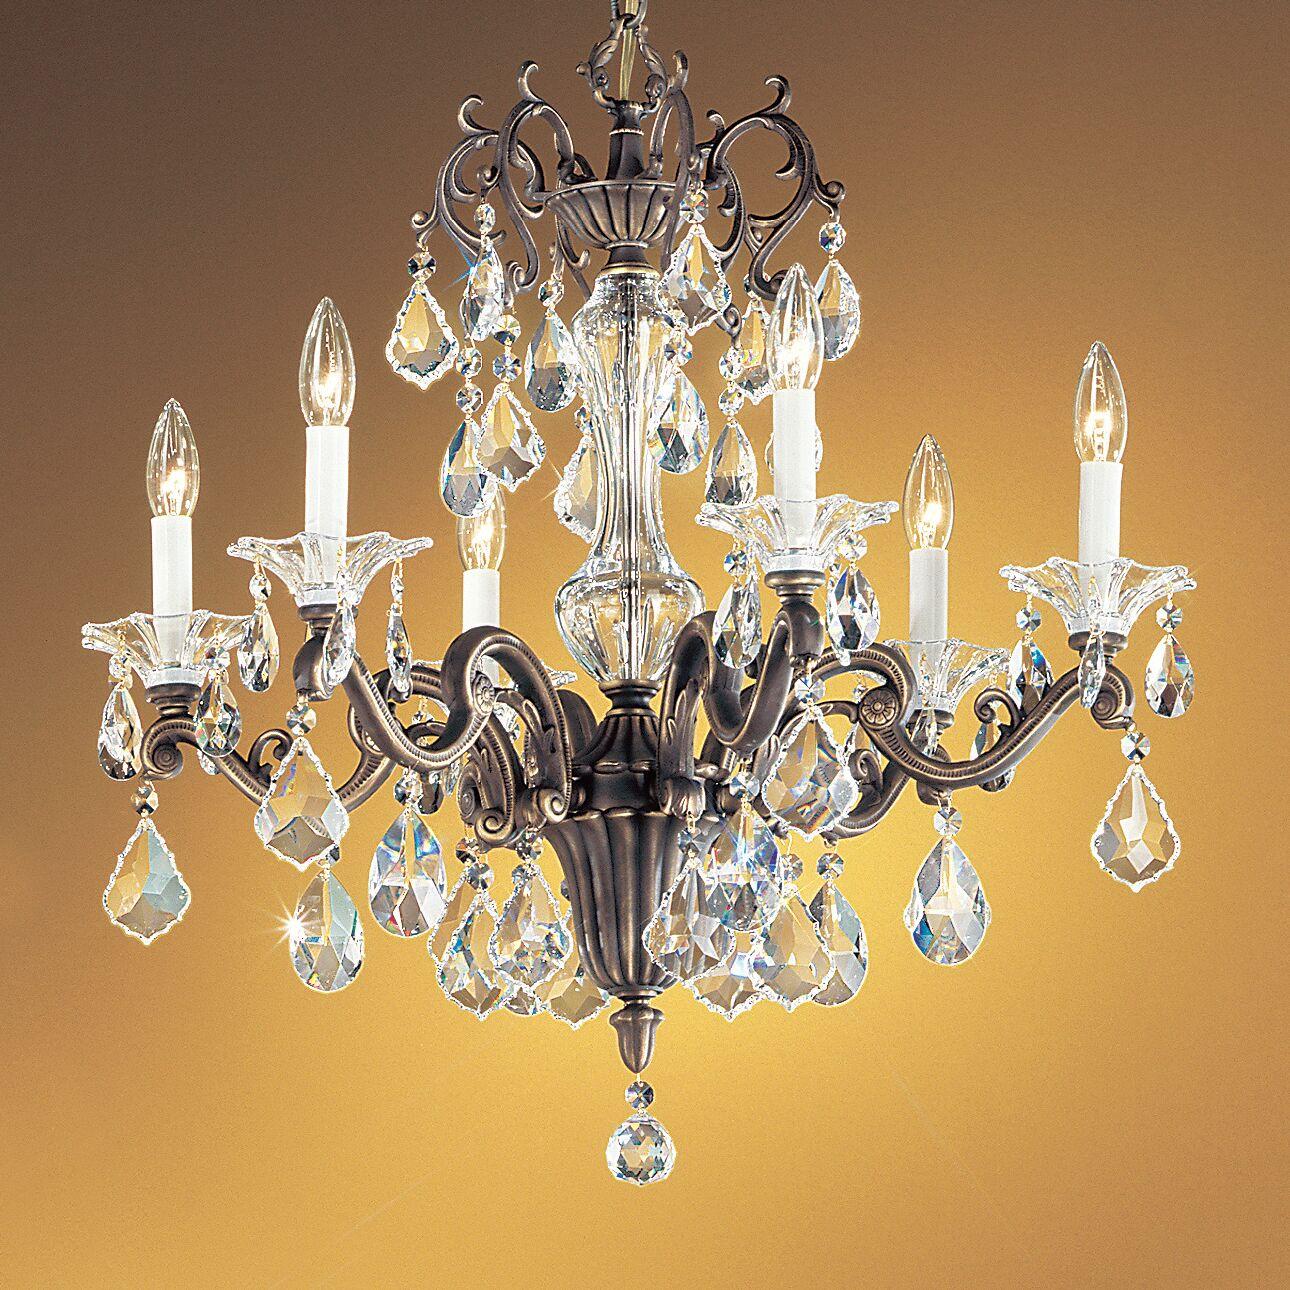 Via Firenze 6-Light Candle Style Chandelier Finish: Silver Plate, Crystal Type: Swarovski Elements